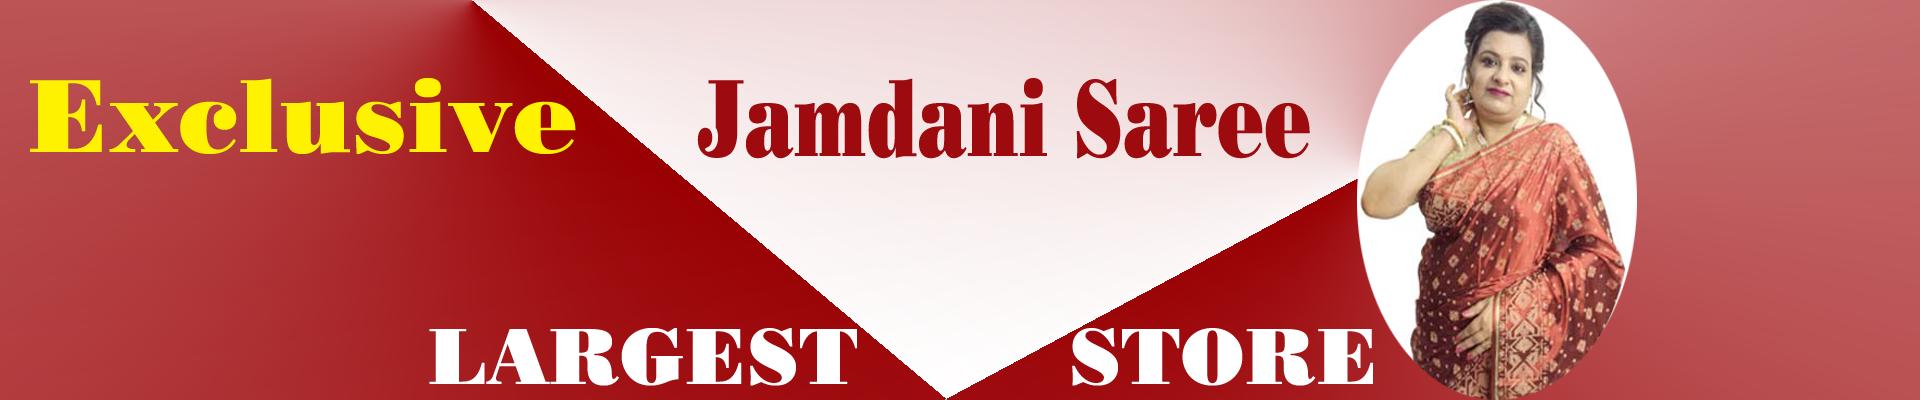 Jamdani Saree Largest Store 01